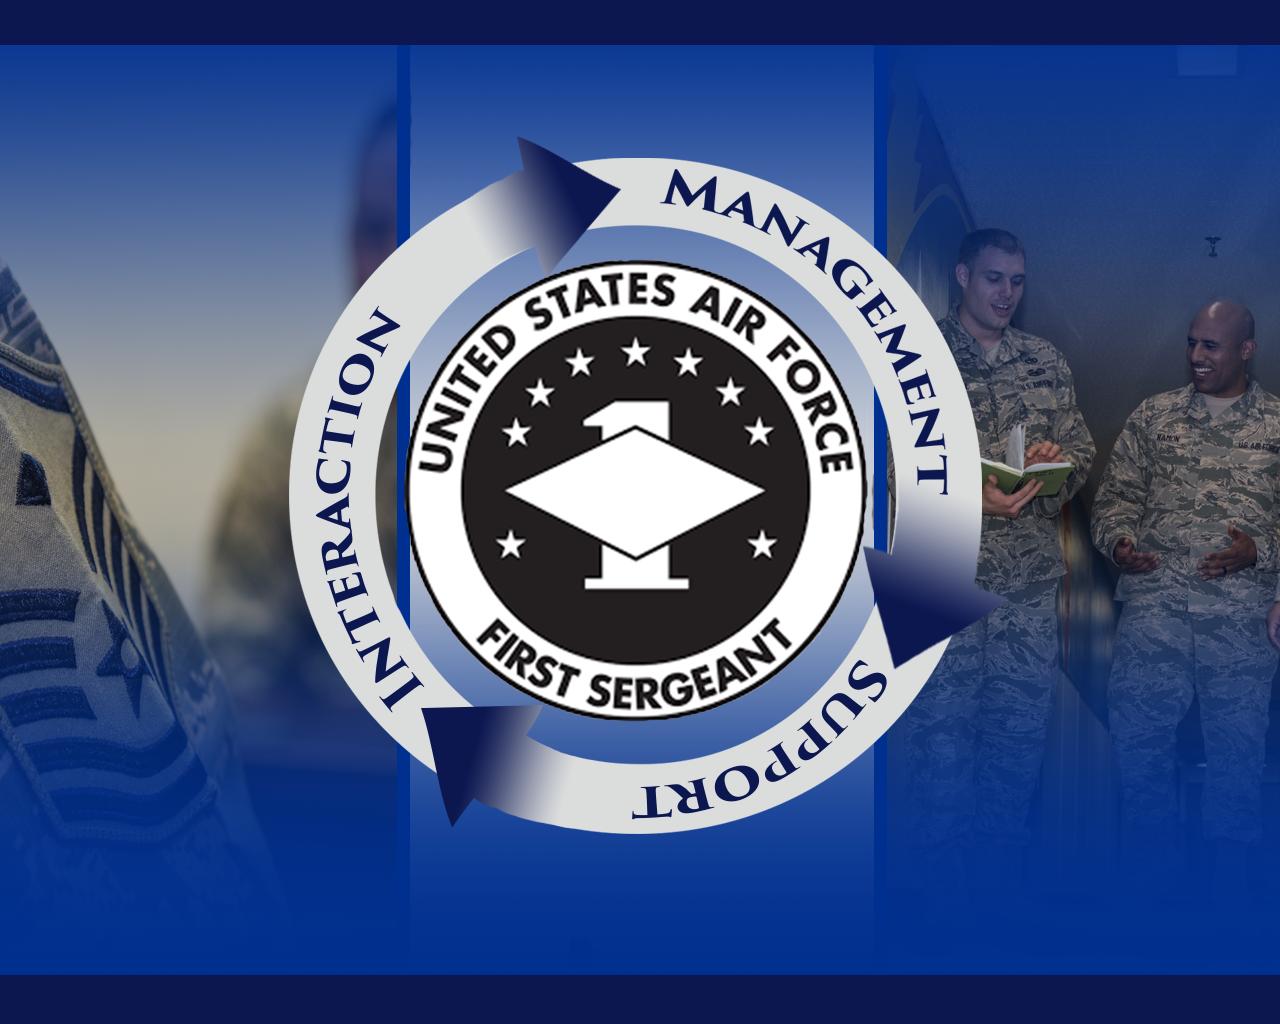 First sergeants: More than a shirt > Misawa Air Base